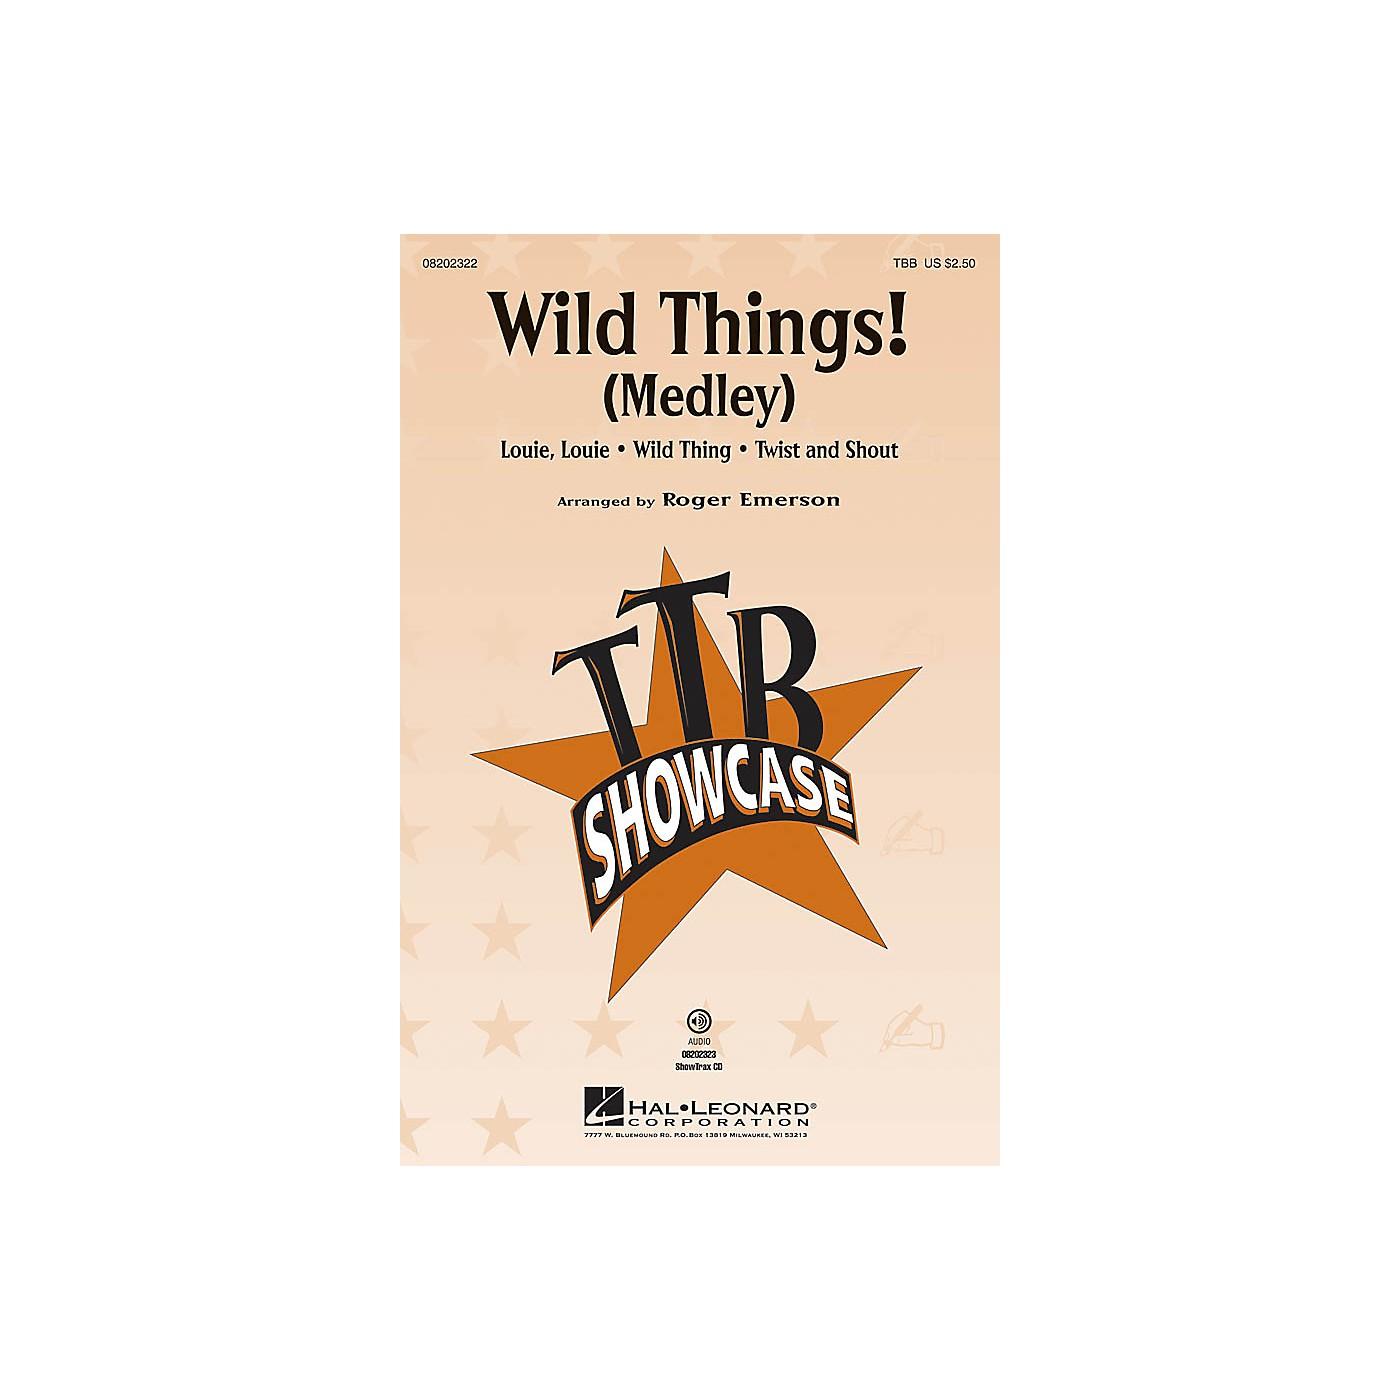 Hal Leonard Wild Things! (Medley) TBB arranged by Roger Emerson thumbnail